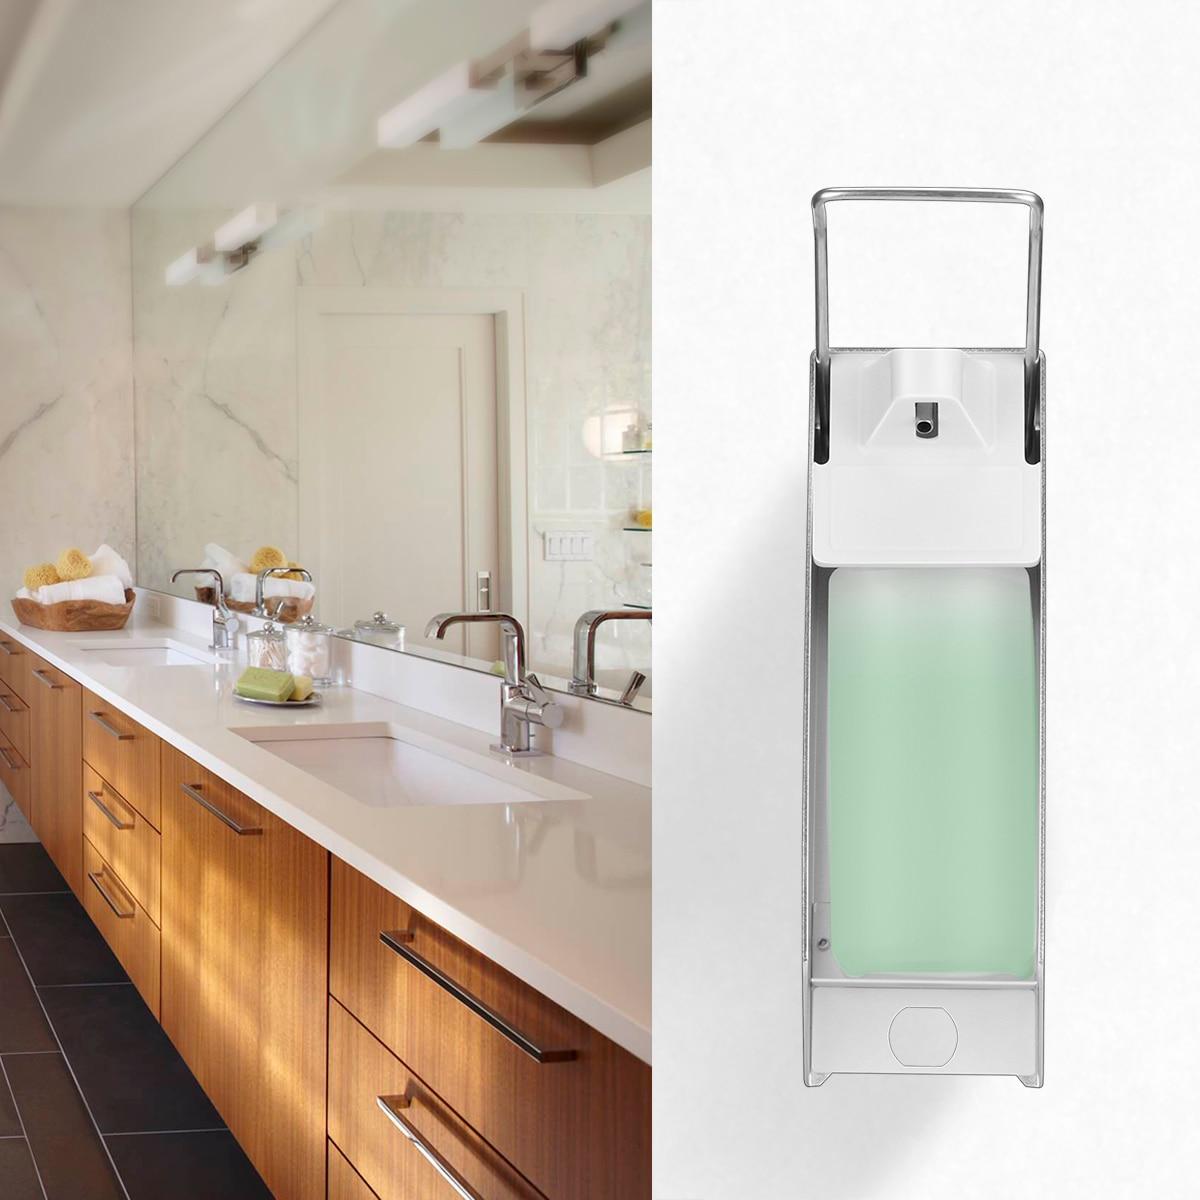 H2124e8eee4c34092a0c60a20fc3d3dc4n Wall-Mount Liquid Soap Dispenser Pump Hospital Elbow Press Hand Sanitizer Soap Dispenser Bottle For Kitchen Hotel Bathroom